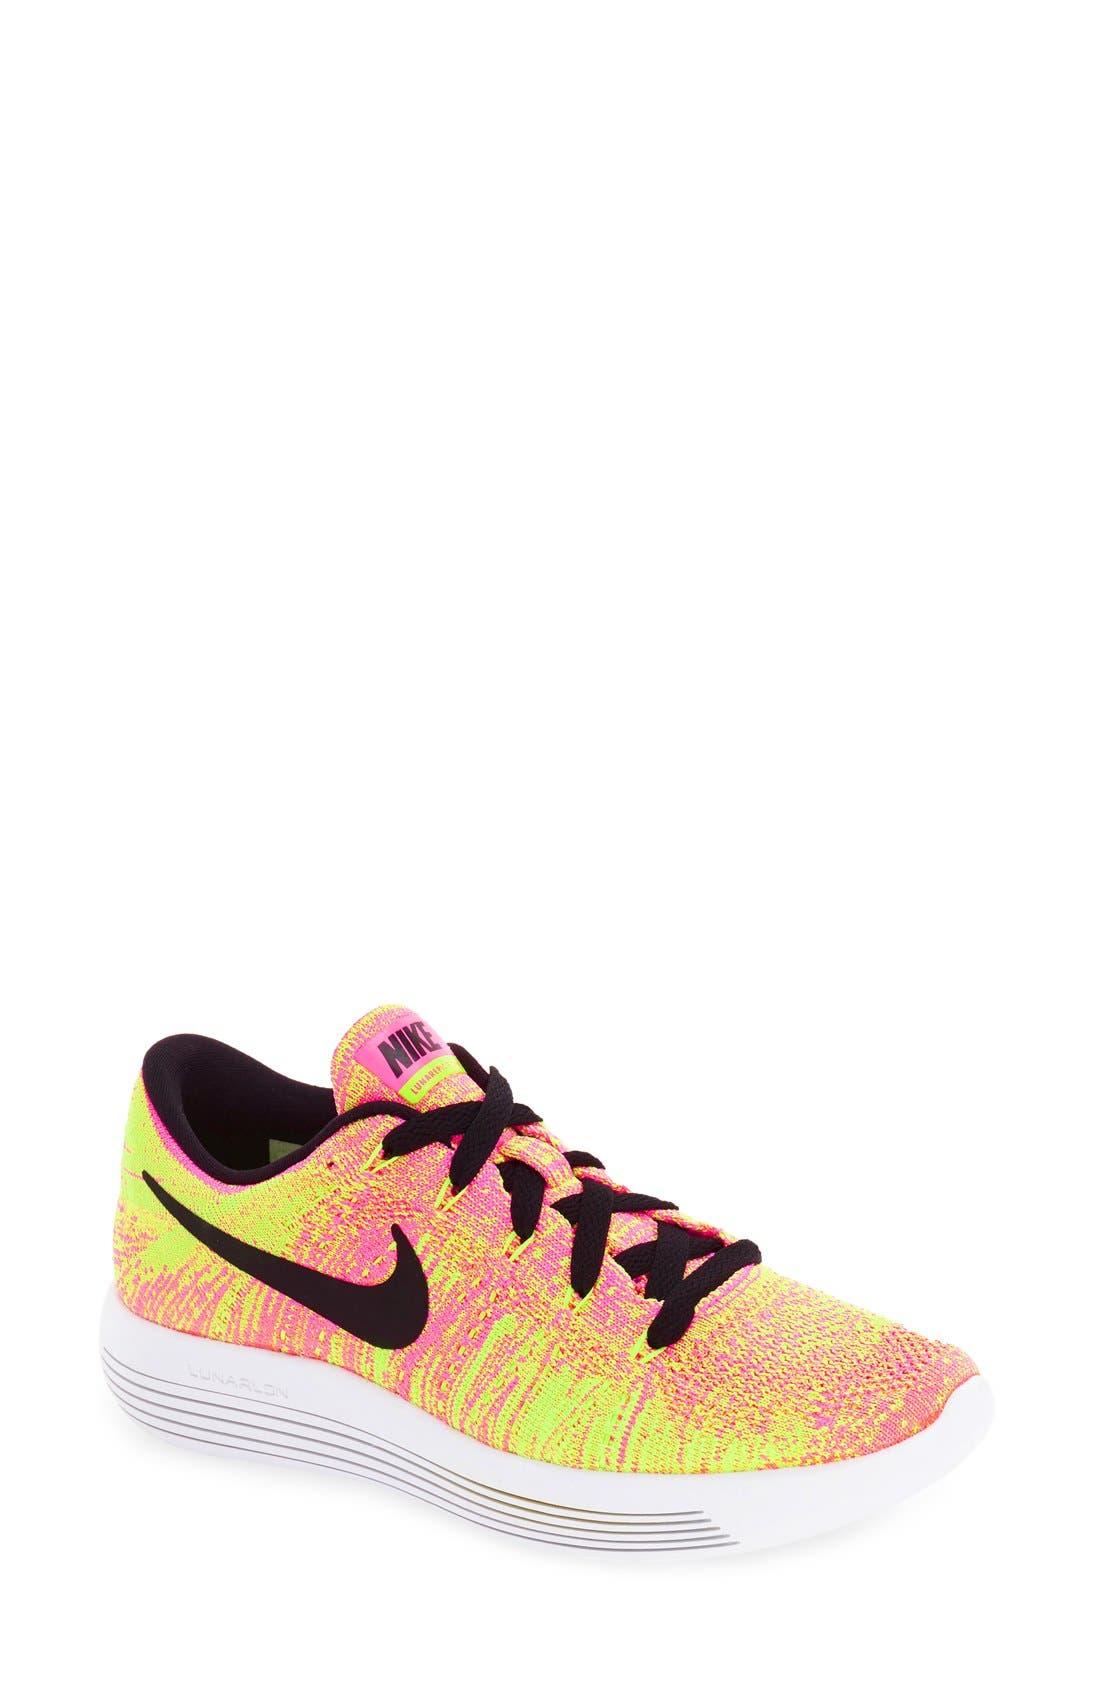 Main Image - Nike 'Flyknit LunarEpic' Running Shoe (Women)